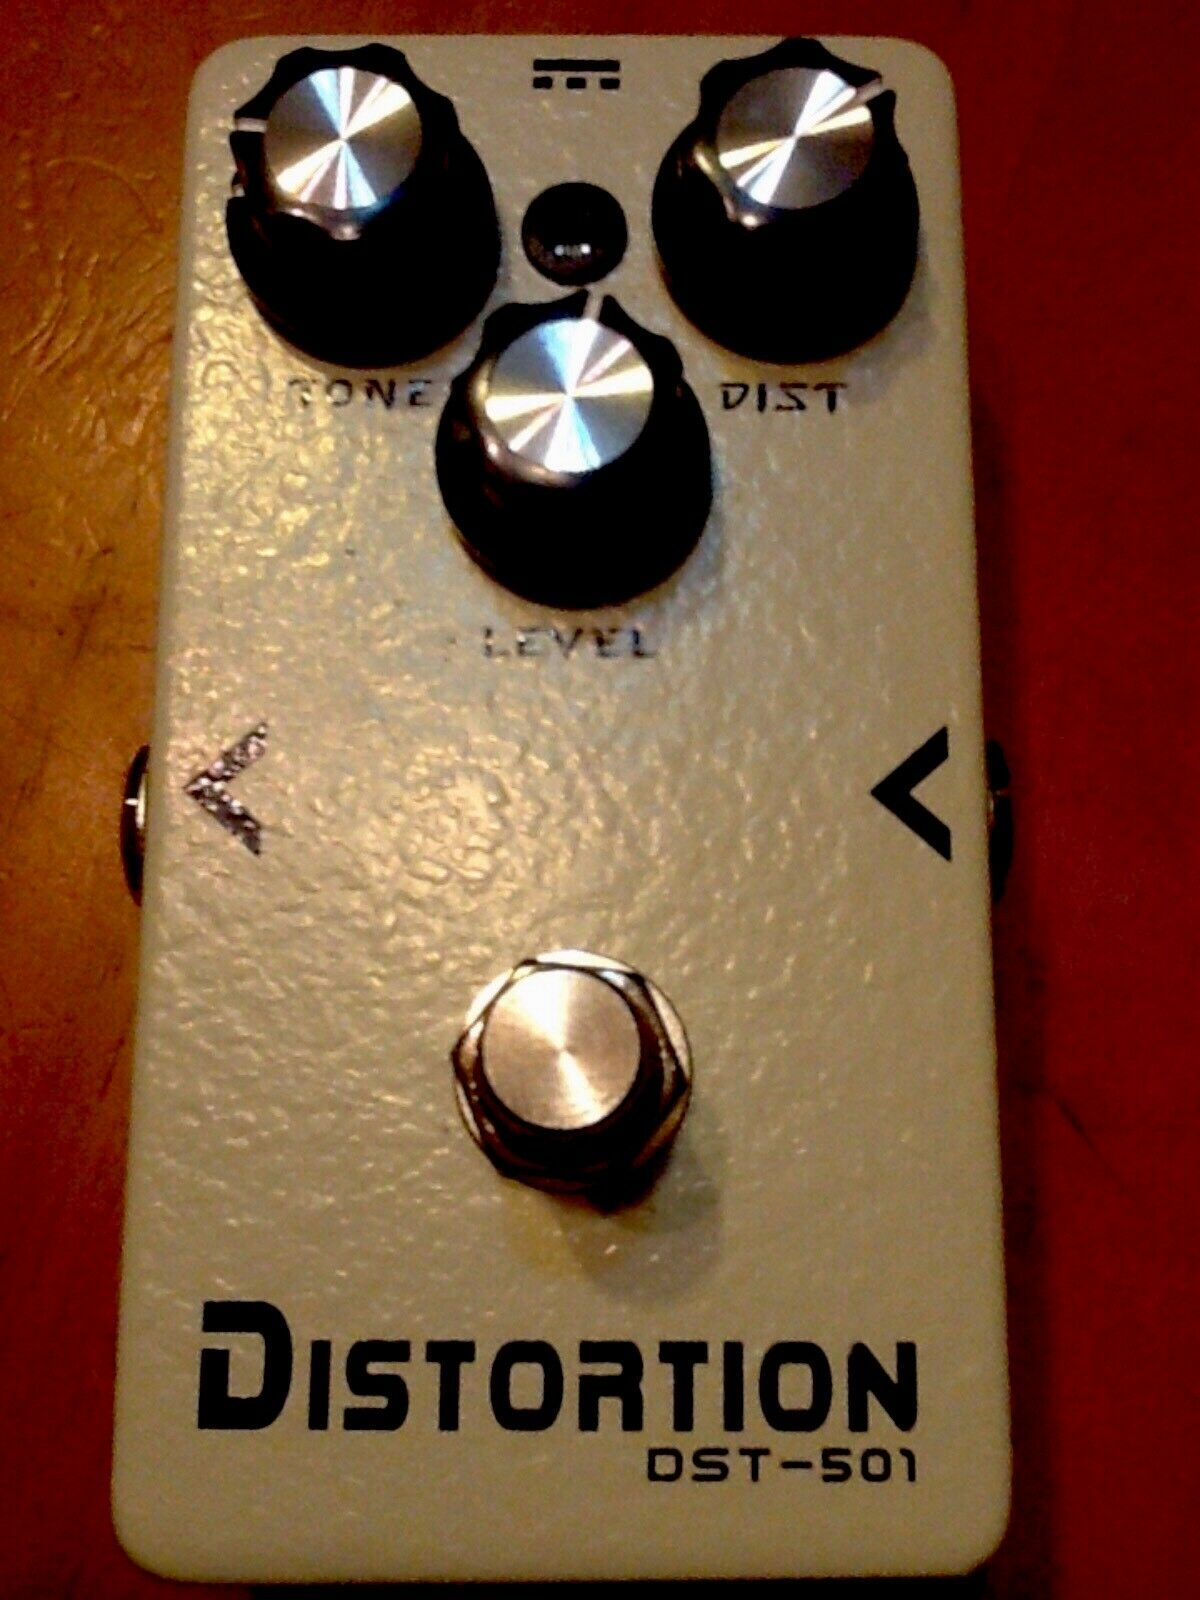 Distortion DST-501 Level Tone Dist Marque Inconnue